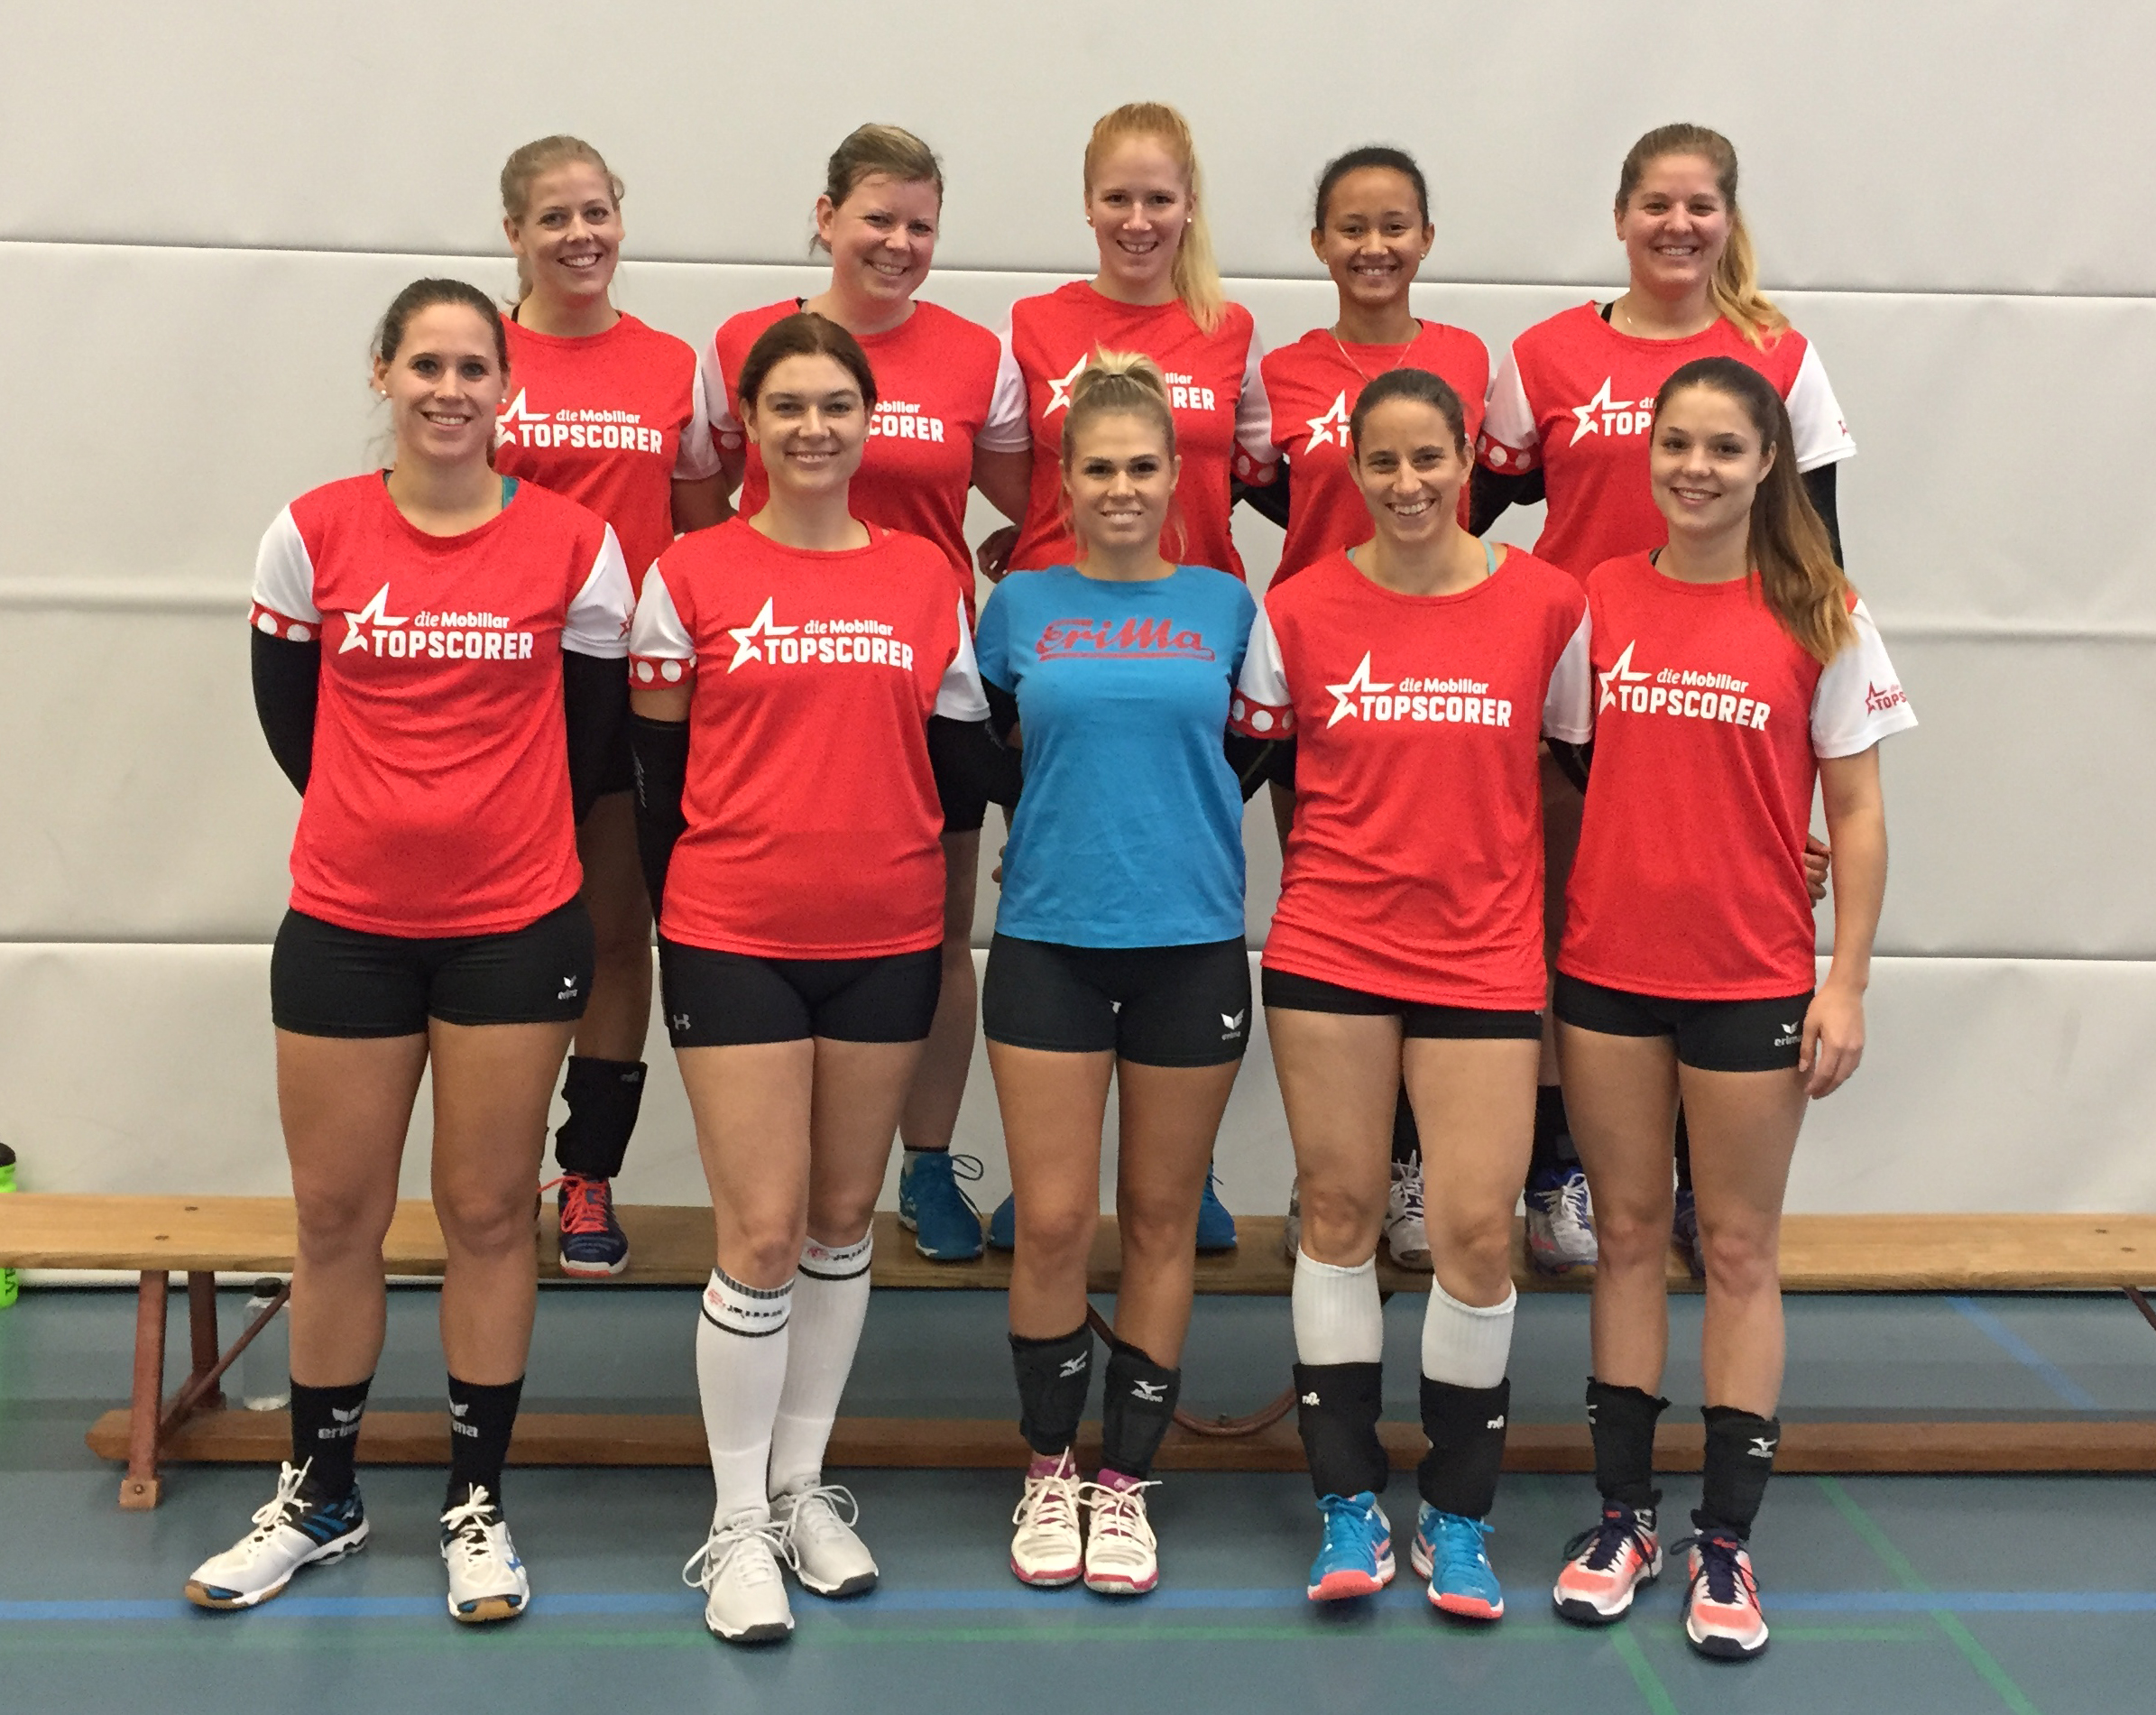 volleyball 3 liga nord